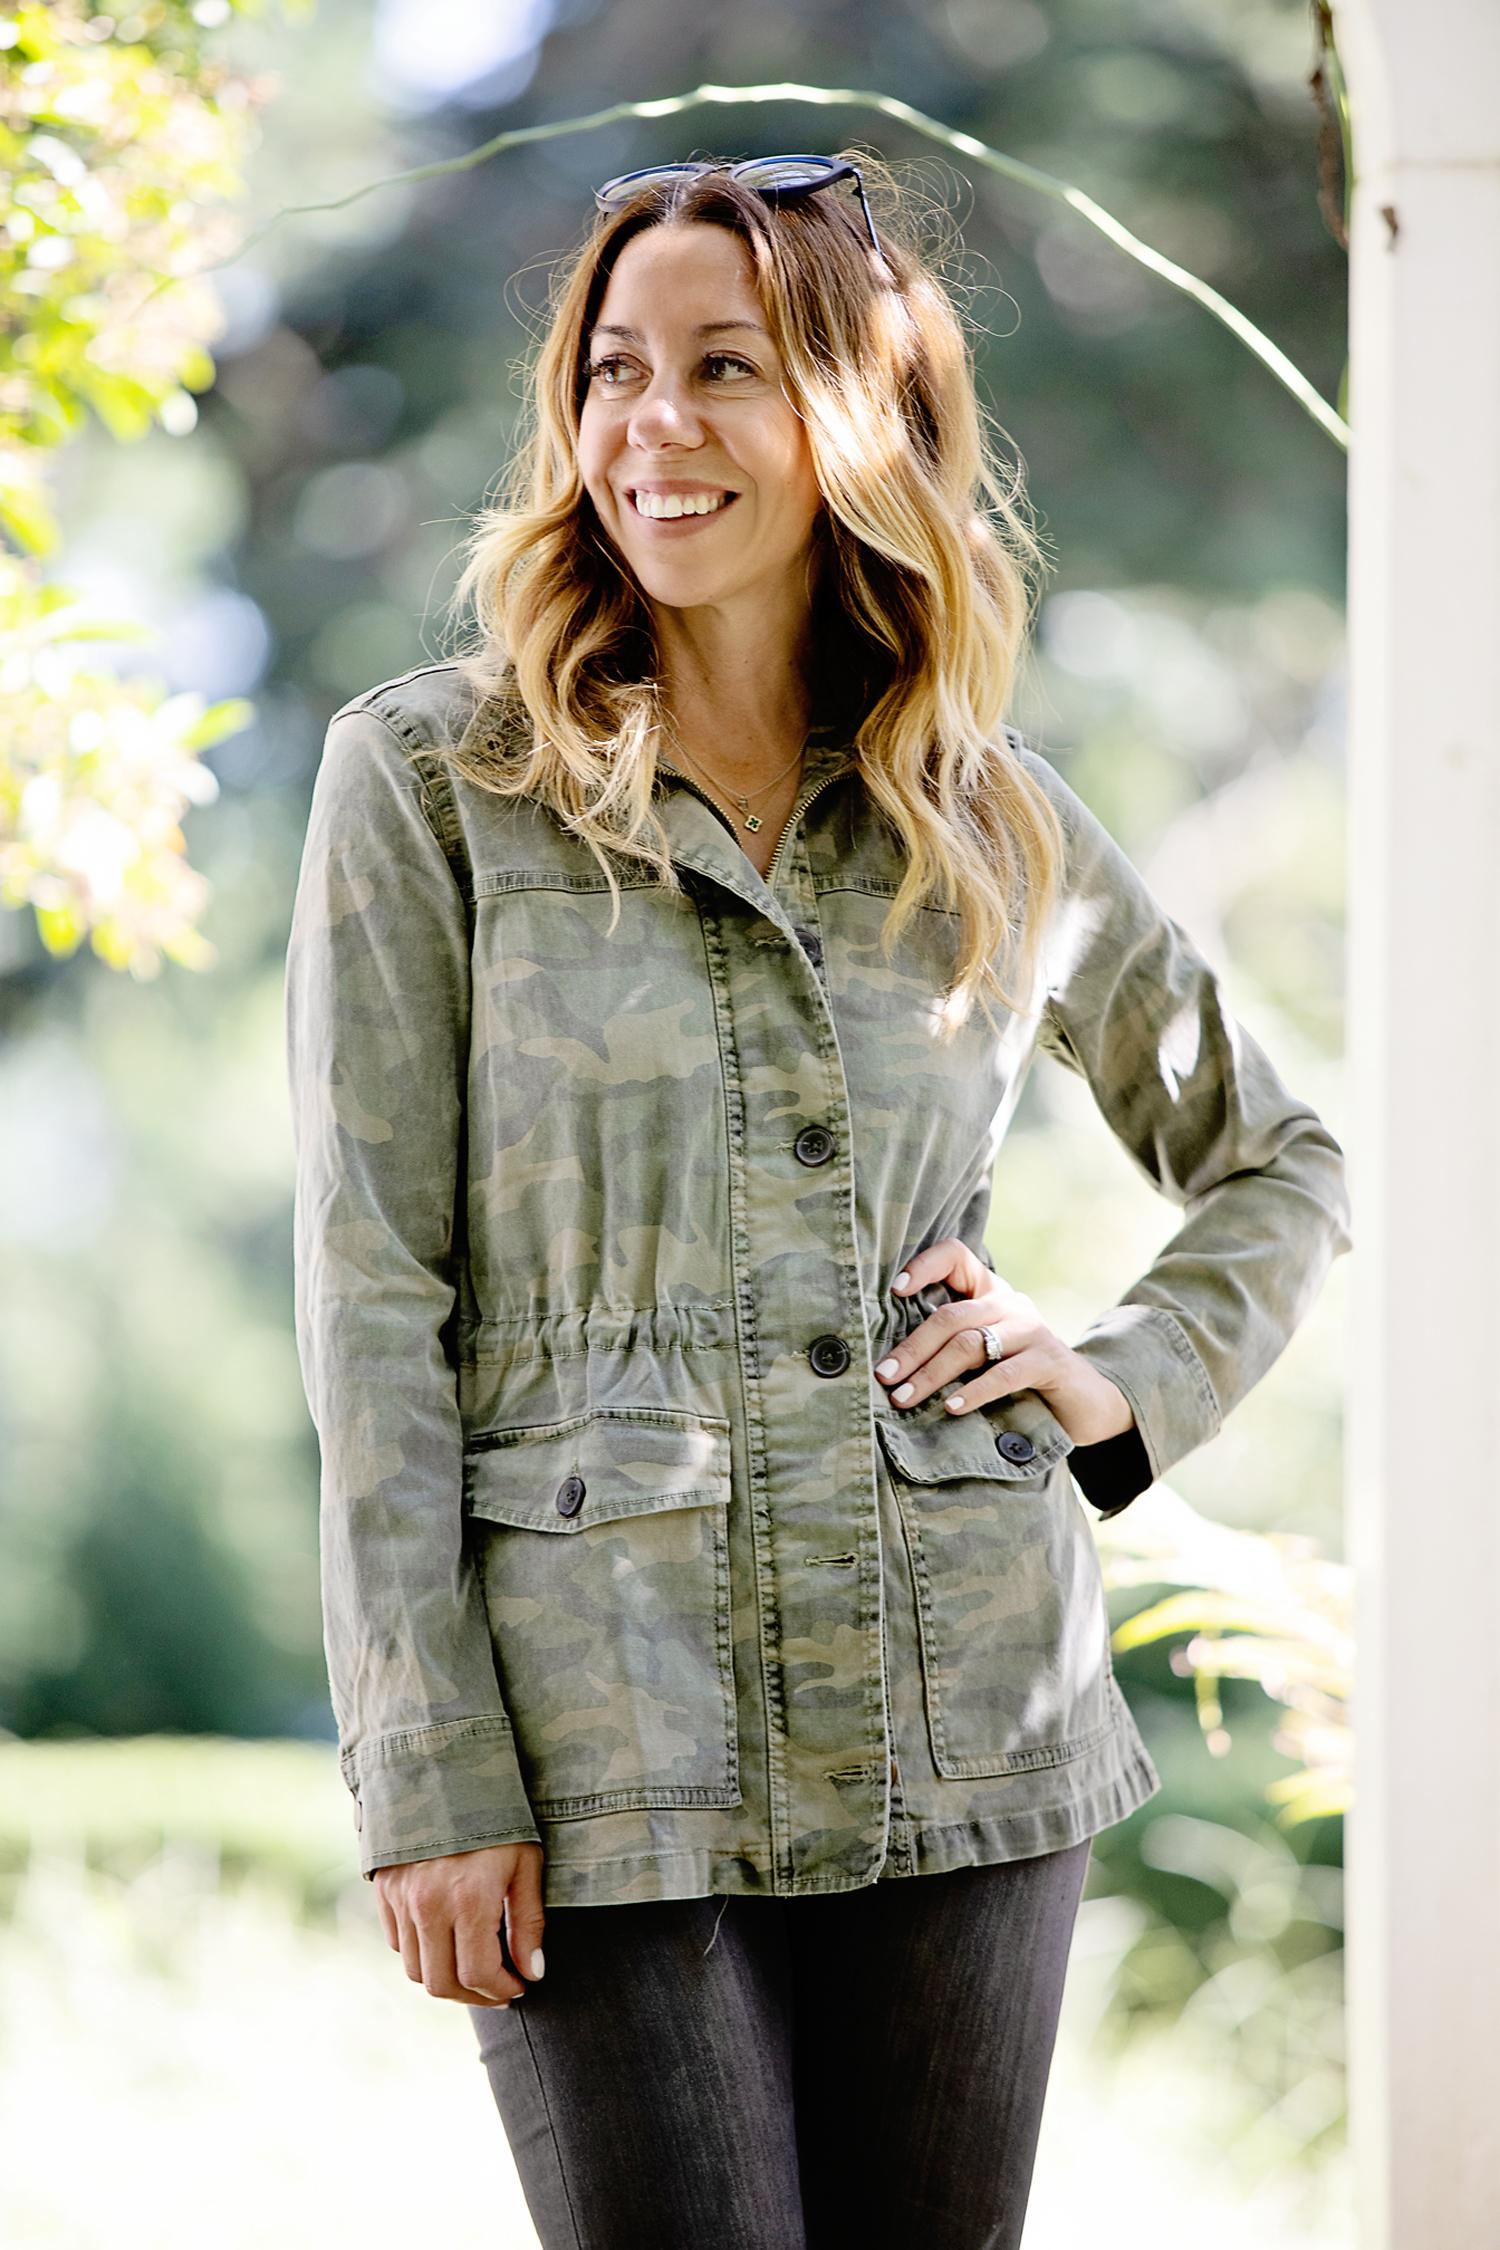 The Motherchic wearing camo utility jacket